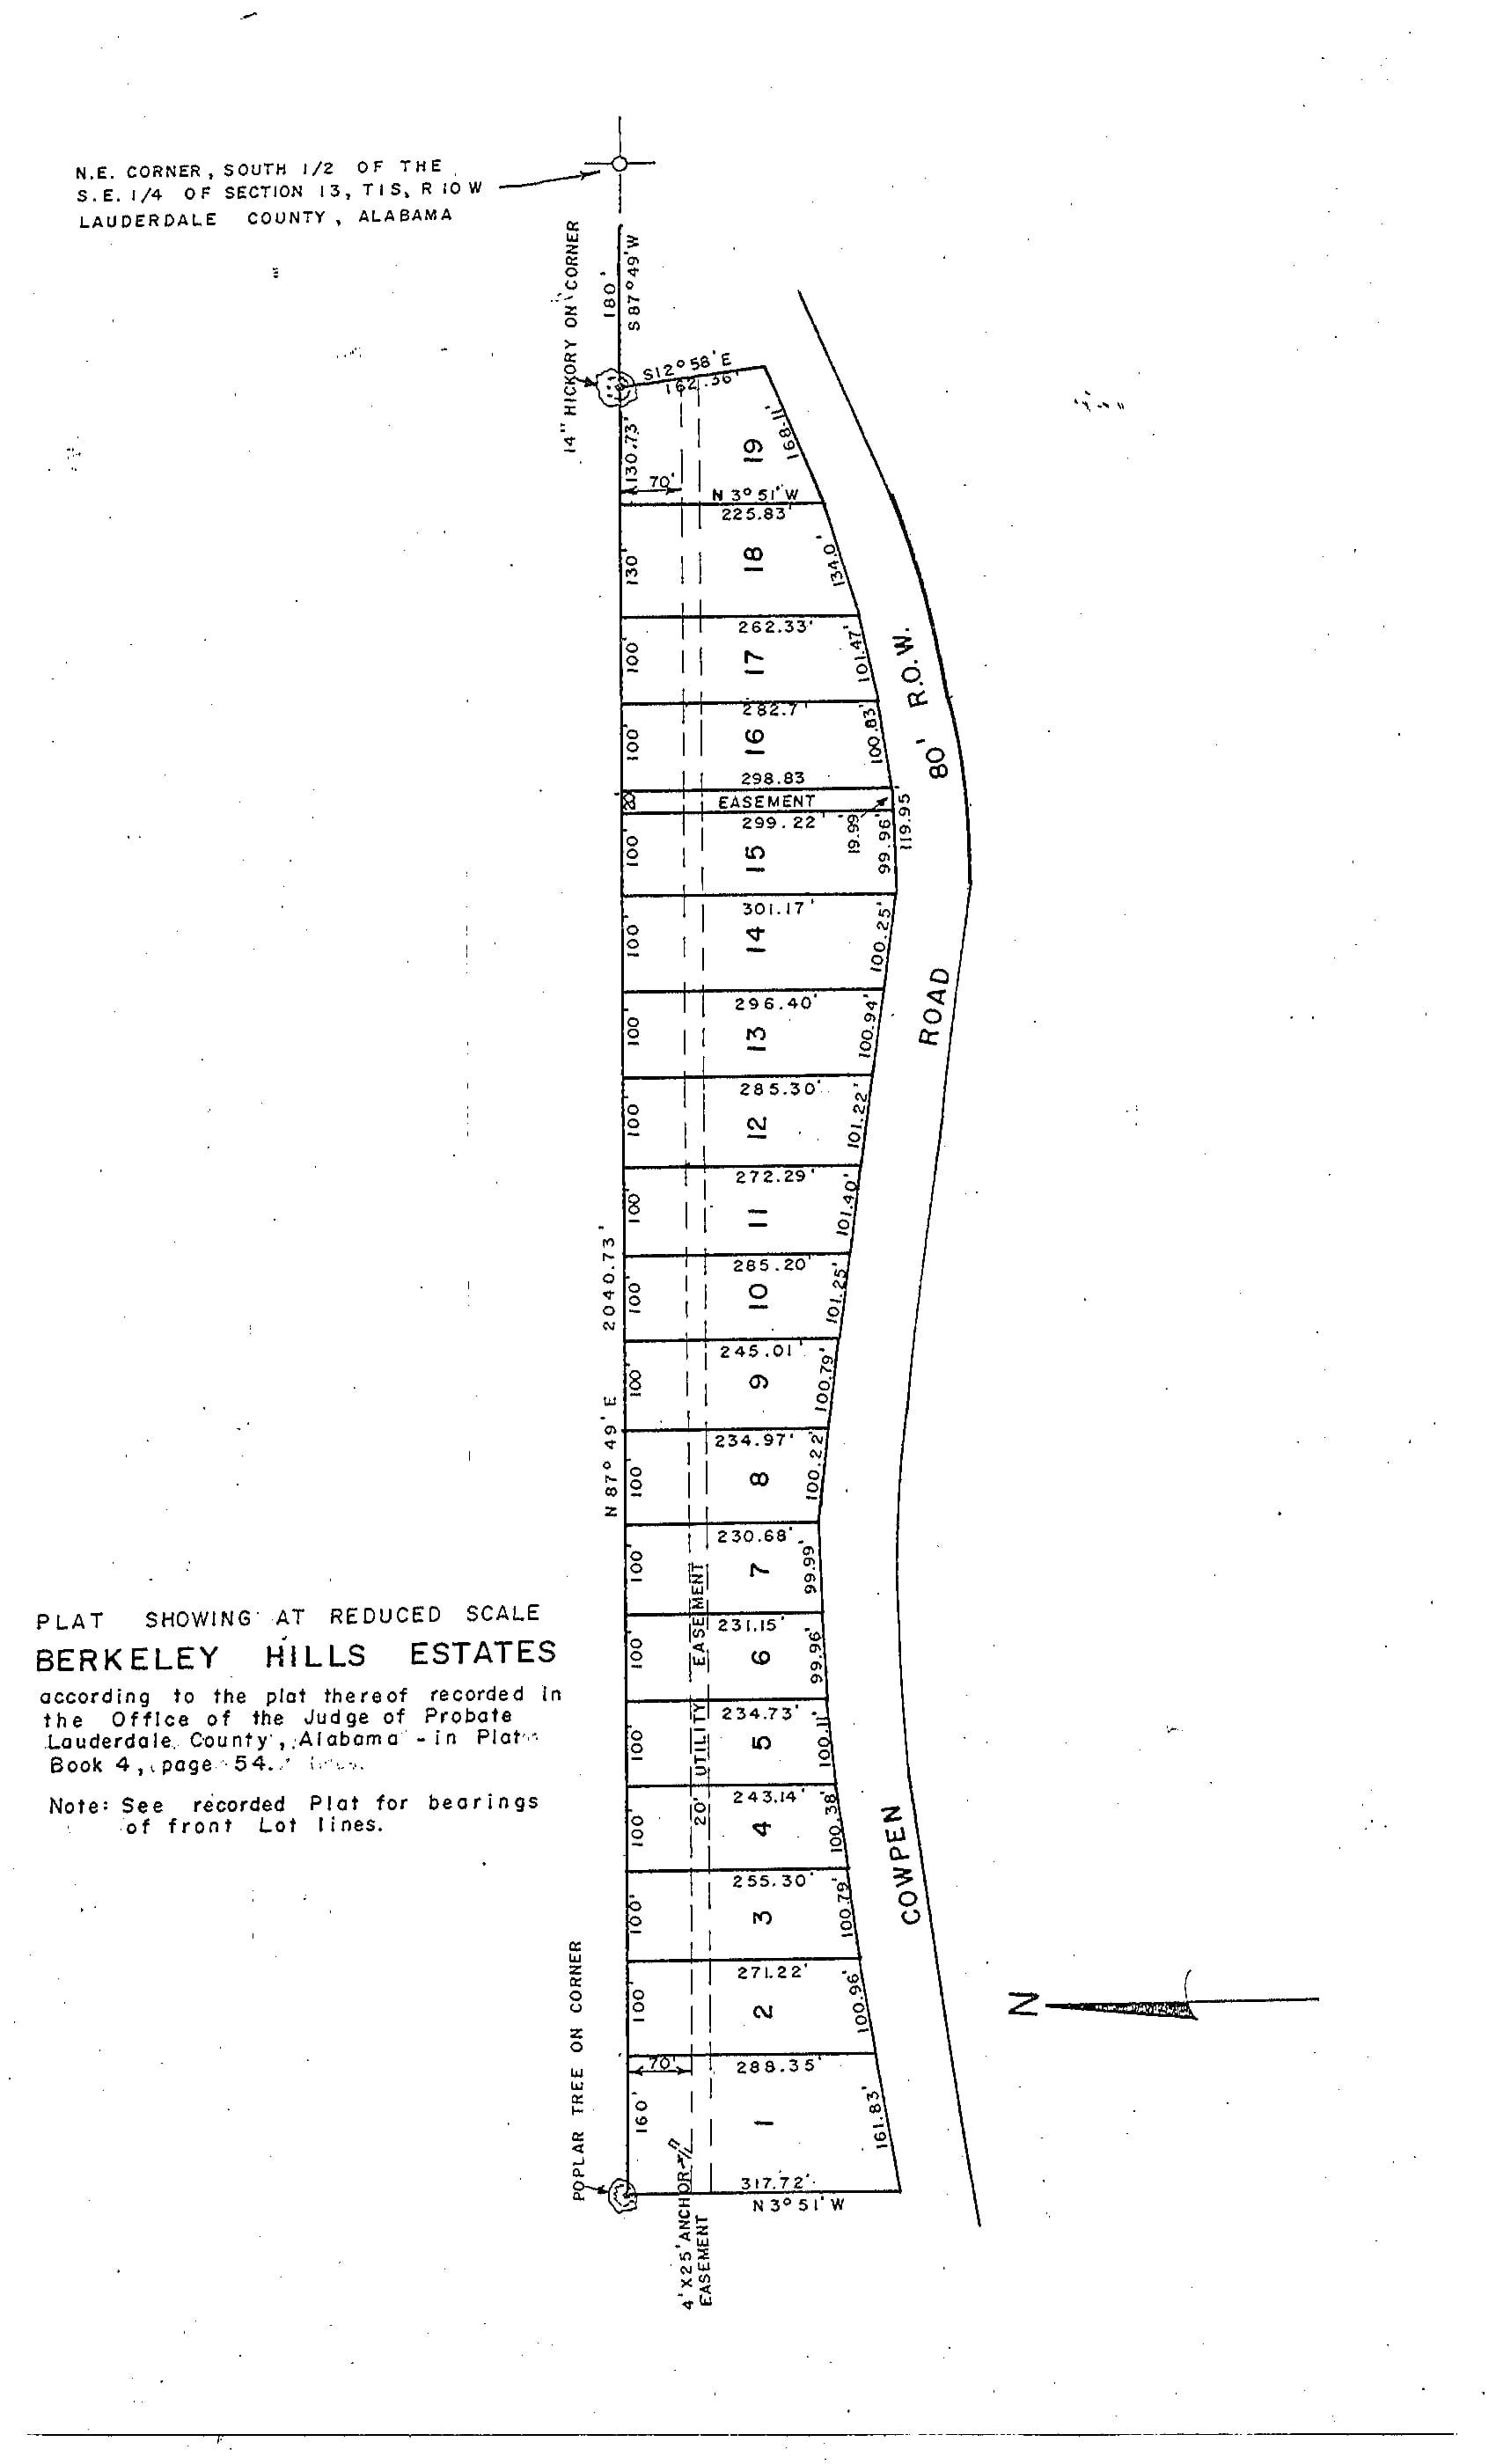 Plat-Berkeley-Hills-Estates-1.jpg